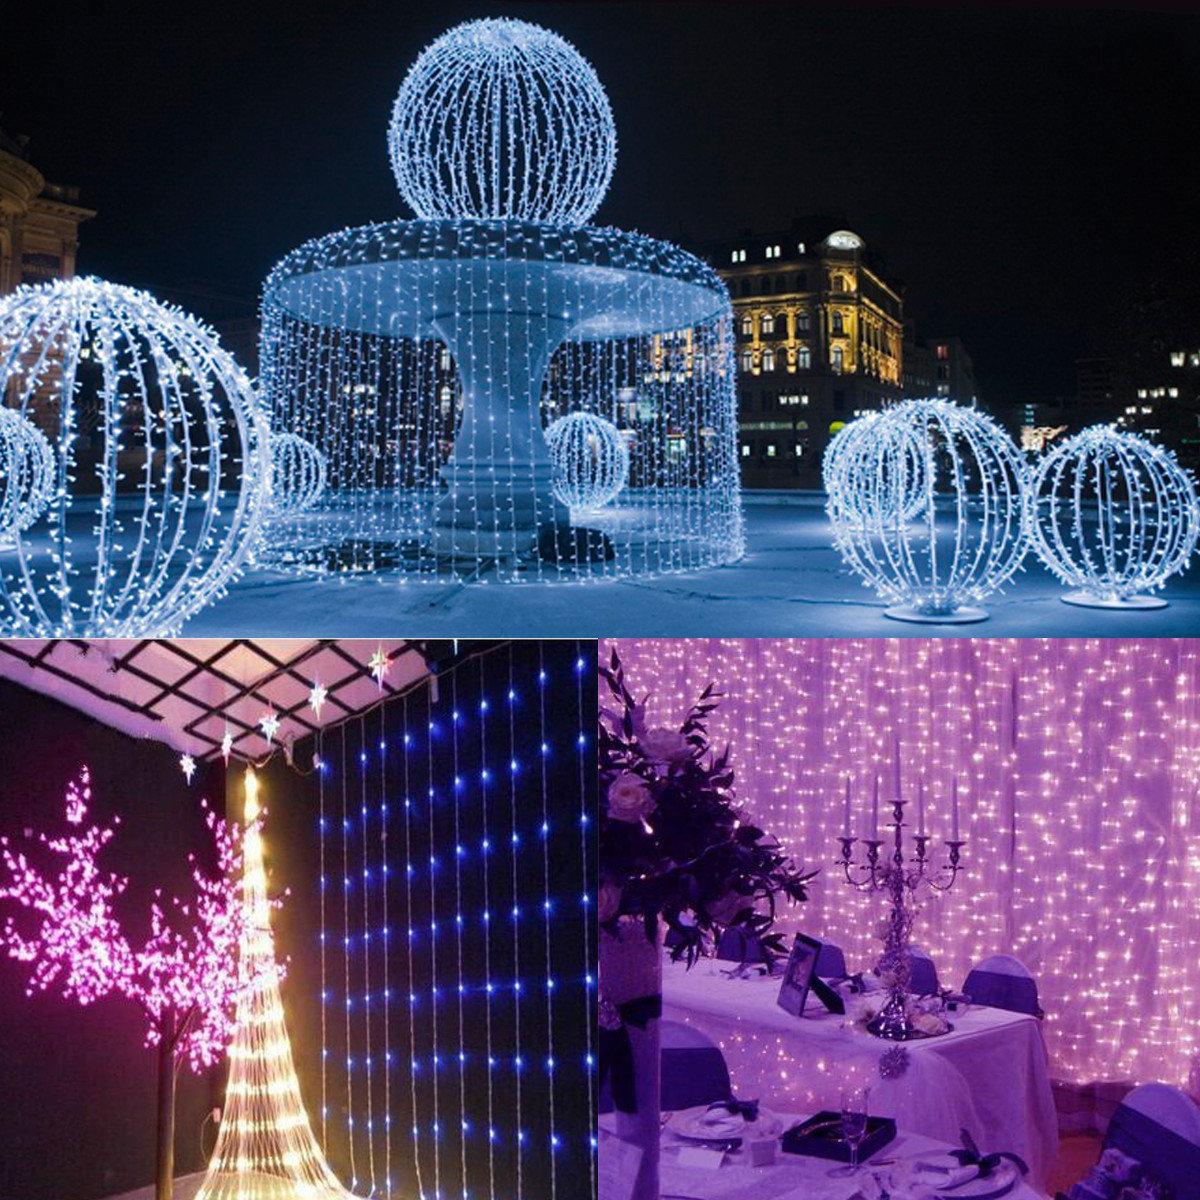 3mx3m 300 Led White Bulb Fairy String Light Curtain Lamp Wedding Party Decor Outdoor Li Cod